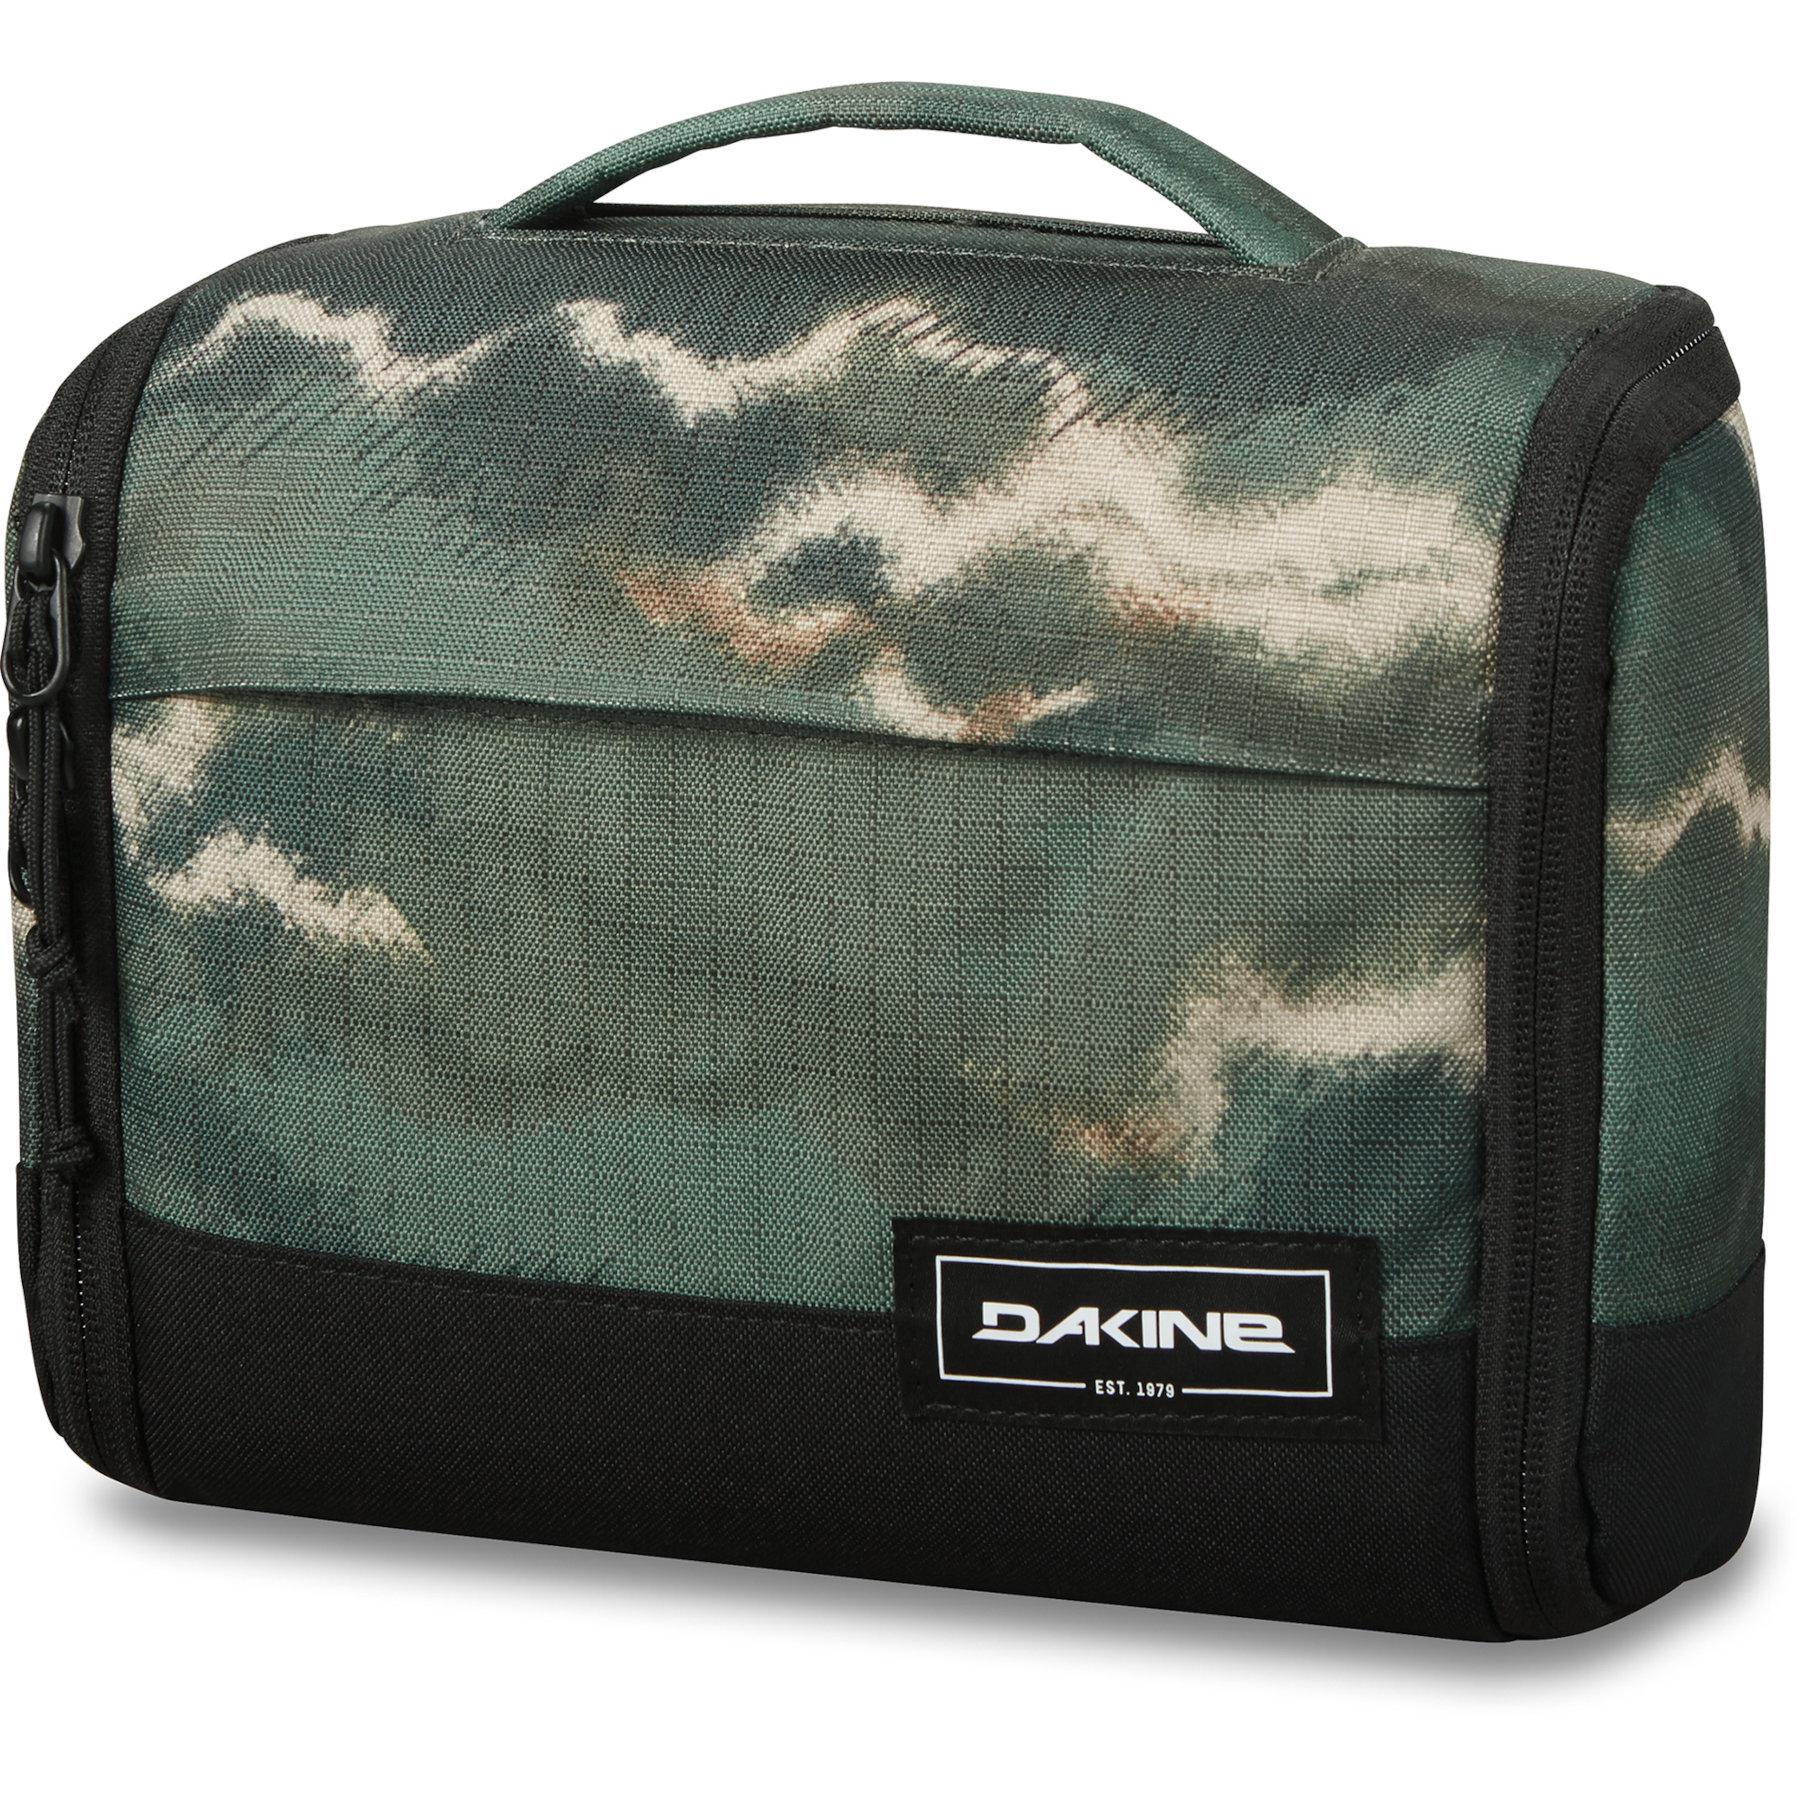 Dakine Daybreak Travel Kit M - Olive Ashcroft Camo